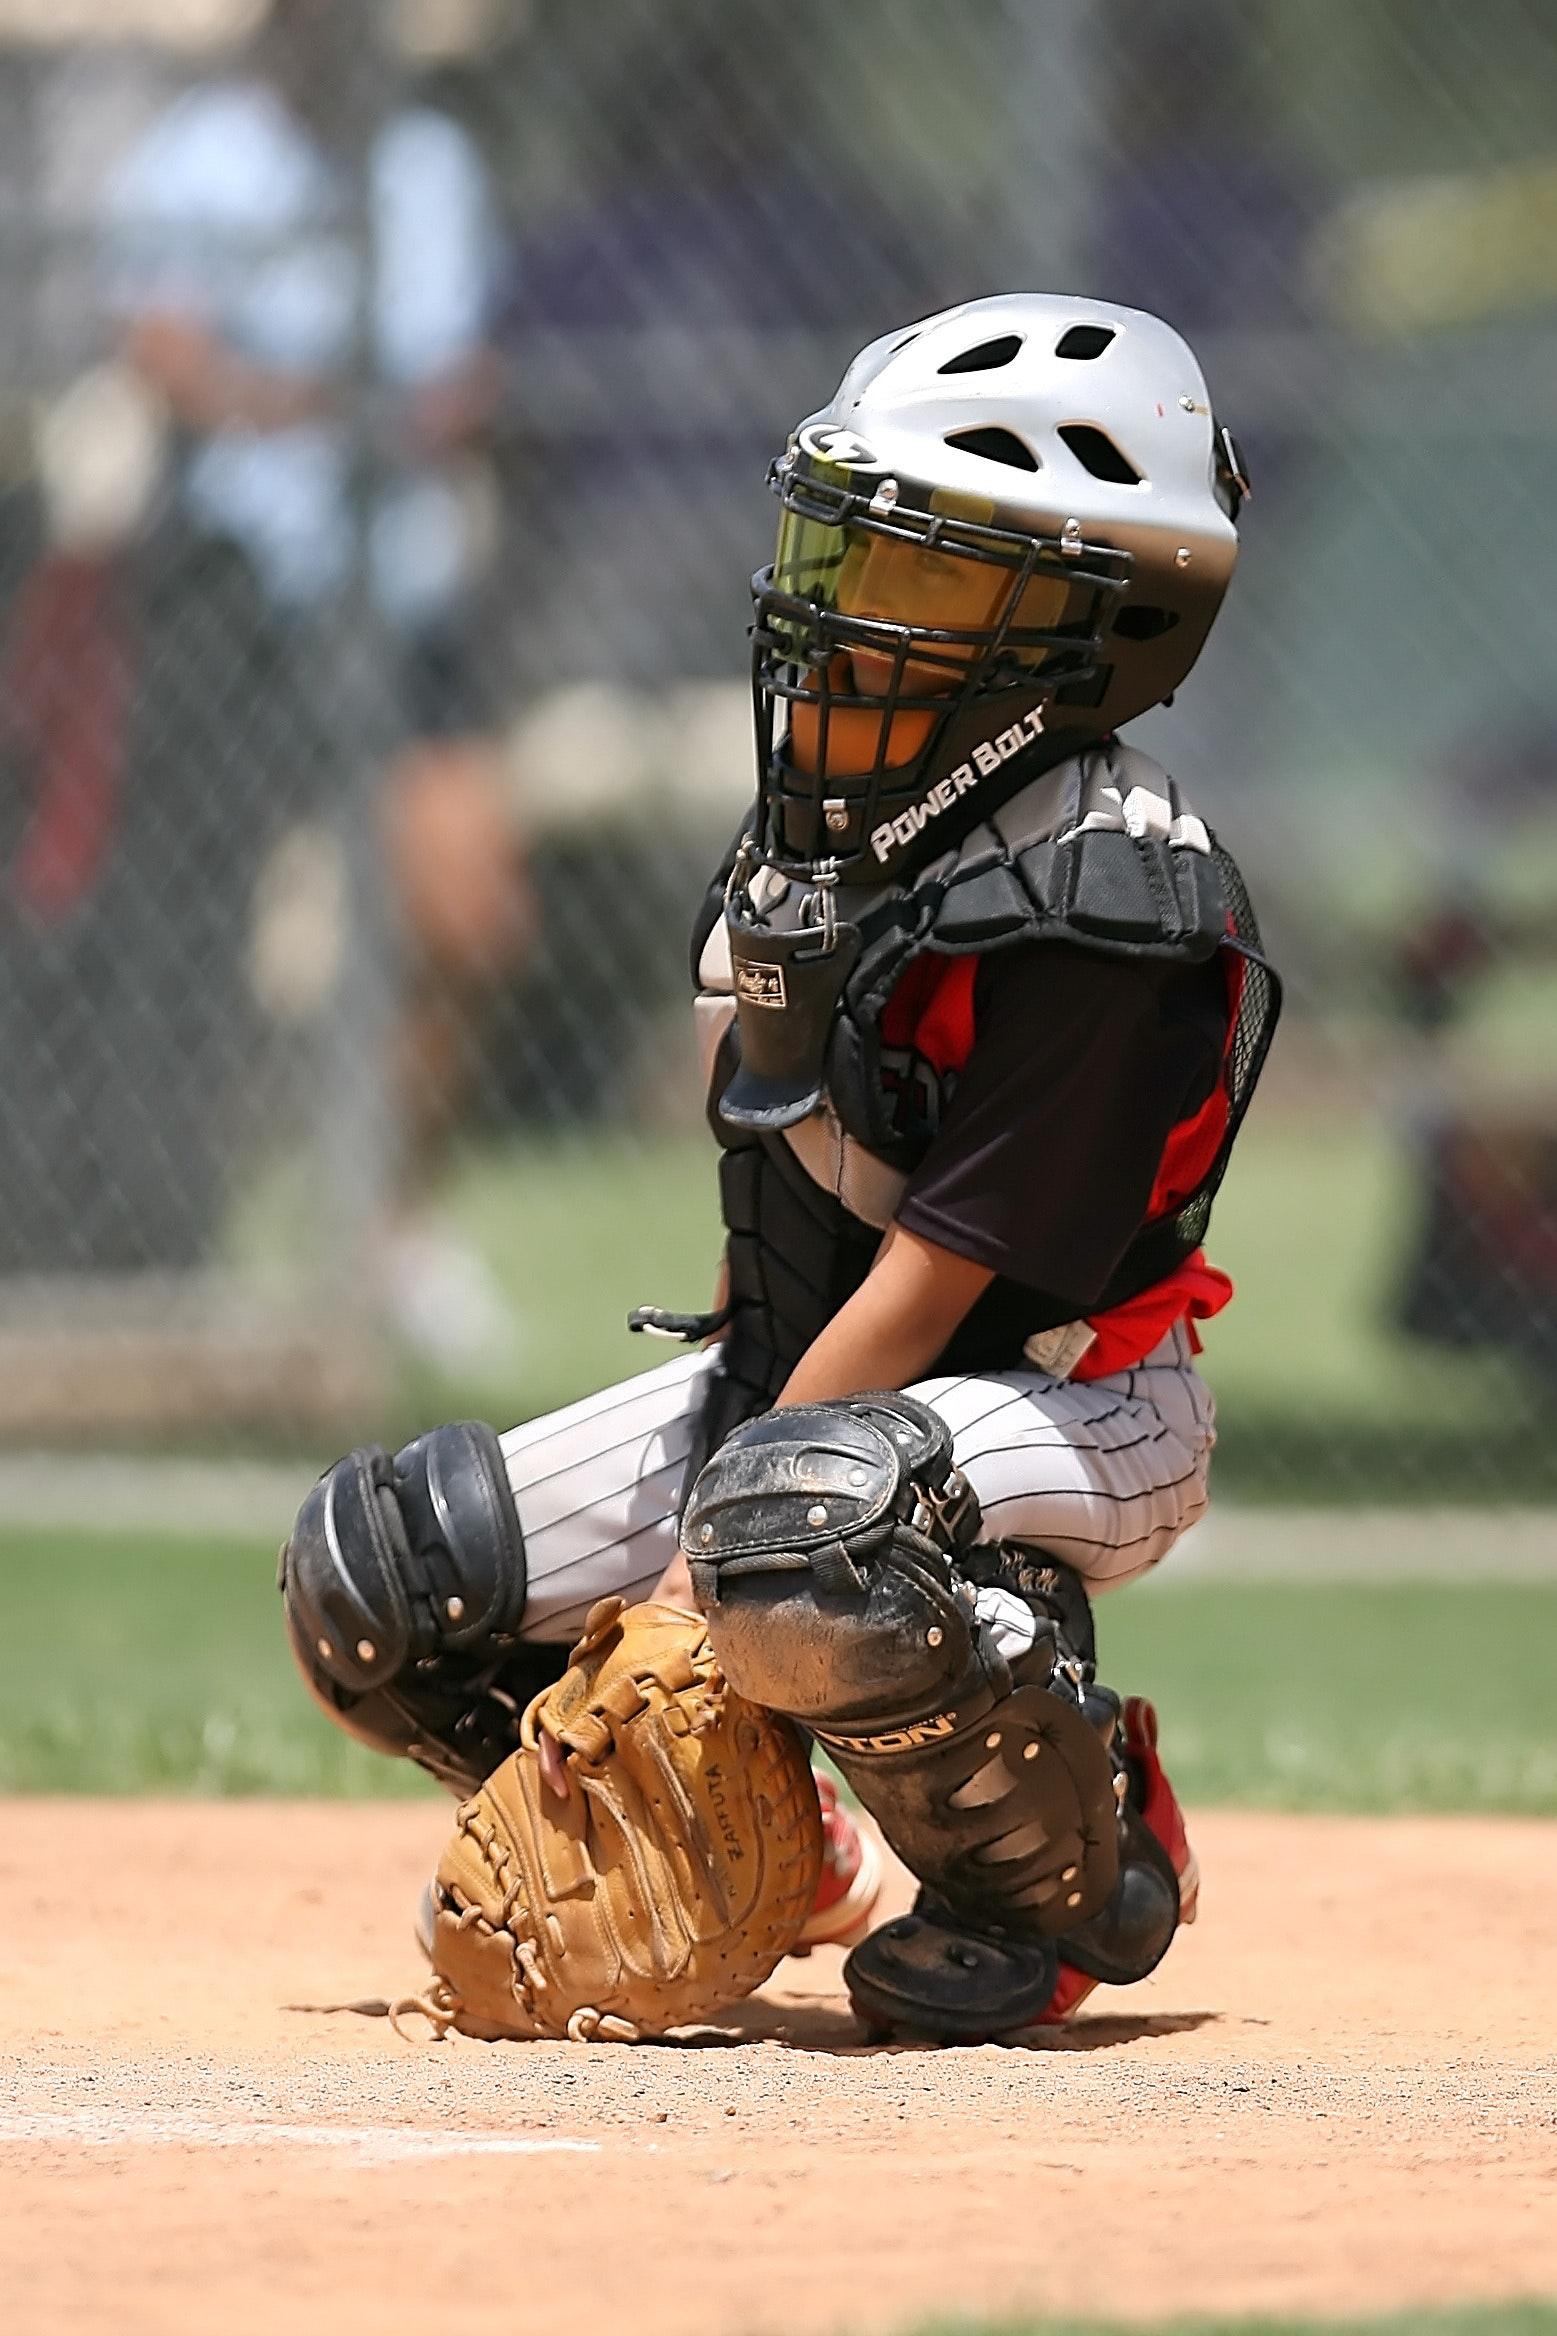 115 116 athlete-baseball-boy-209935.jpg